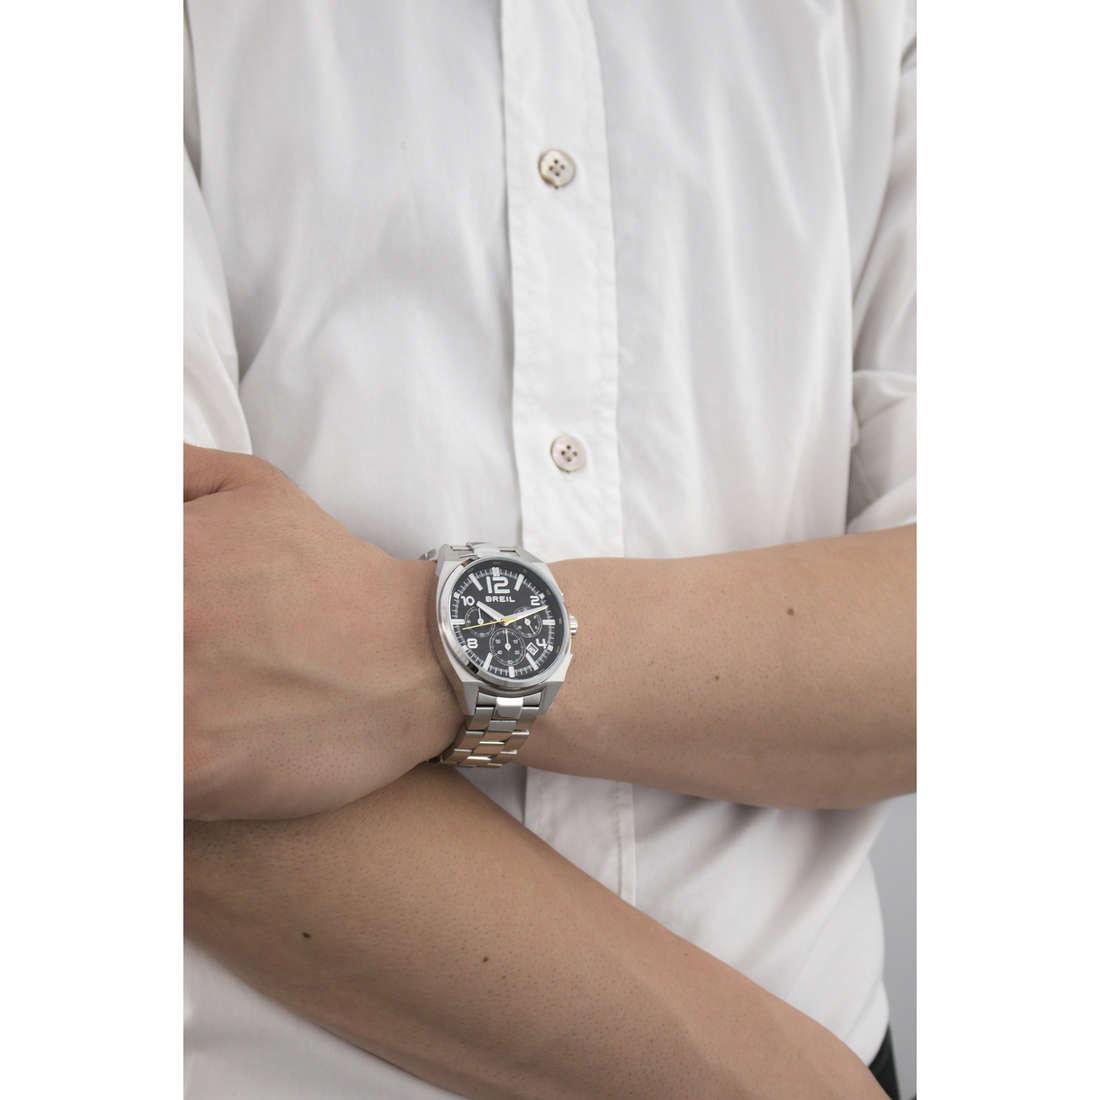 Breil cronografi Master uomo TW1406 indosso